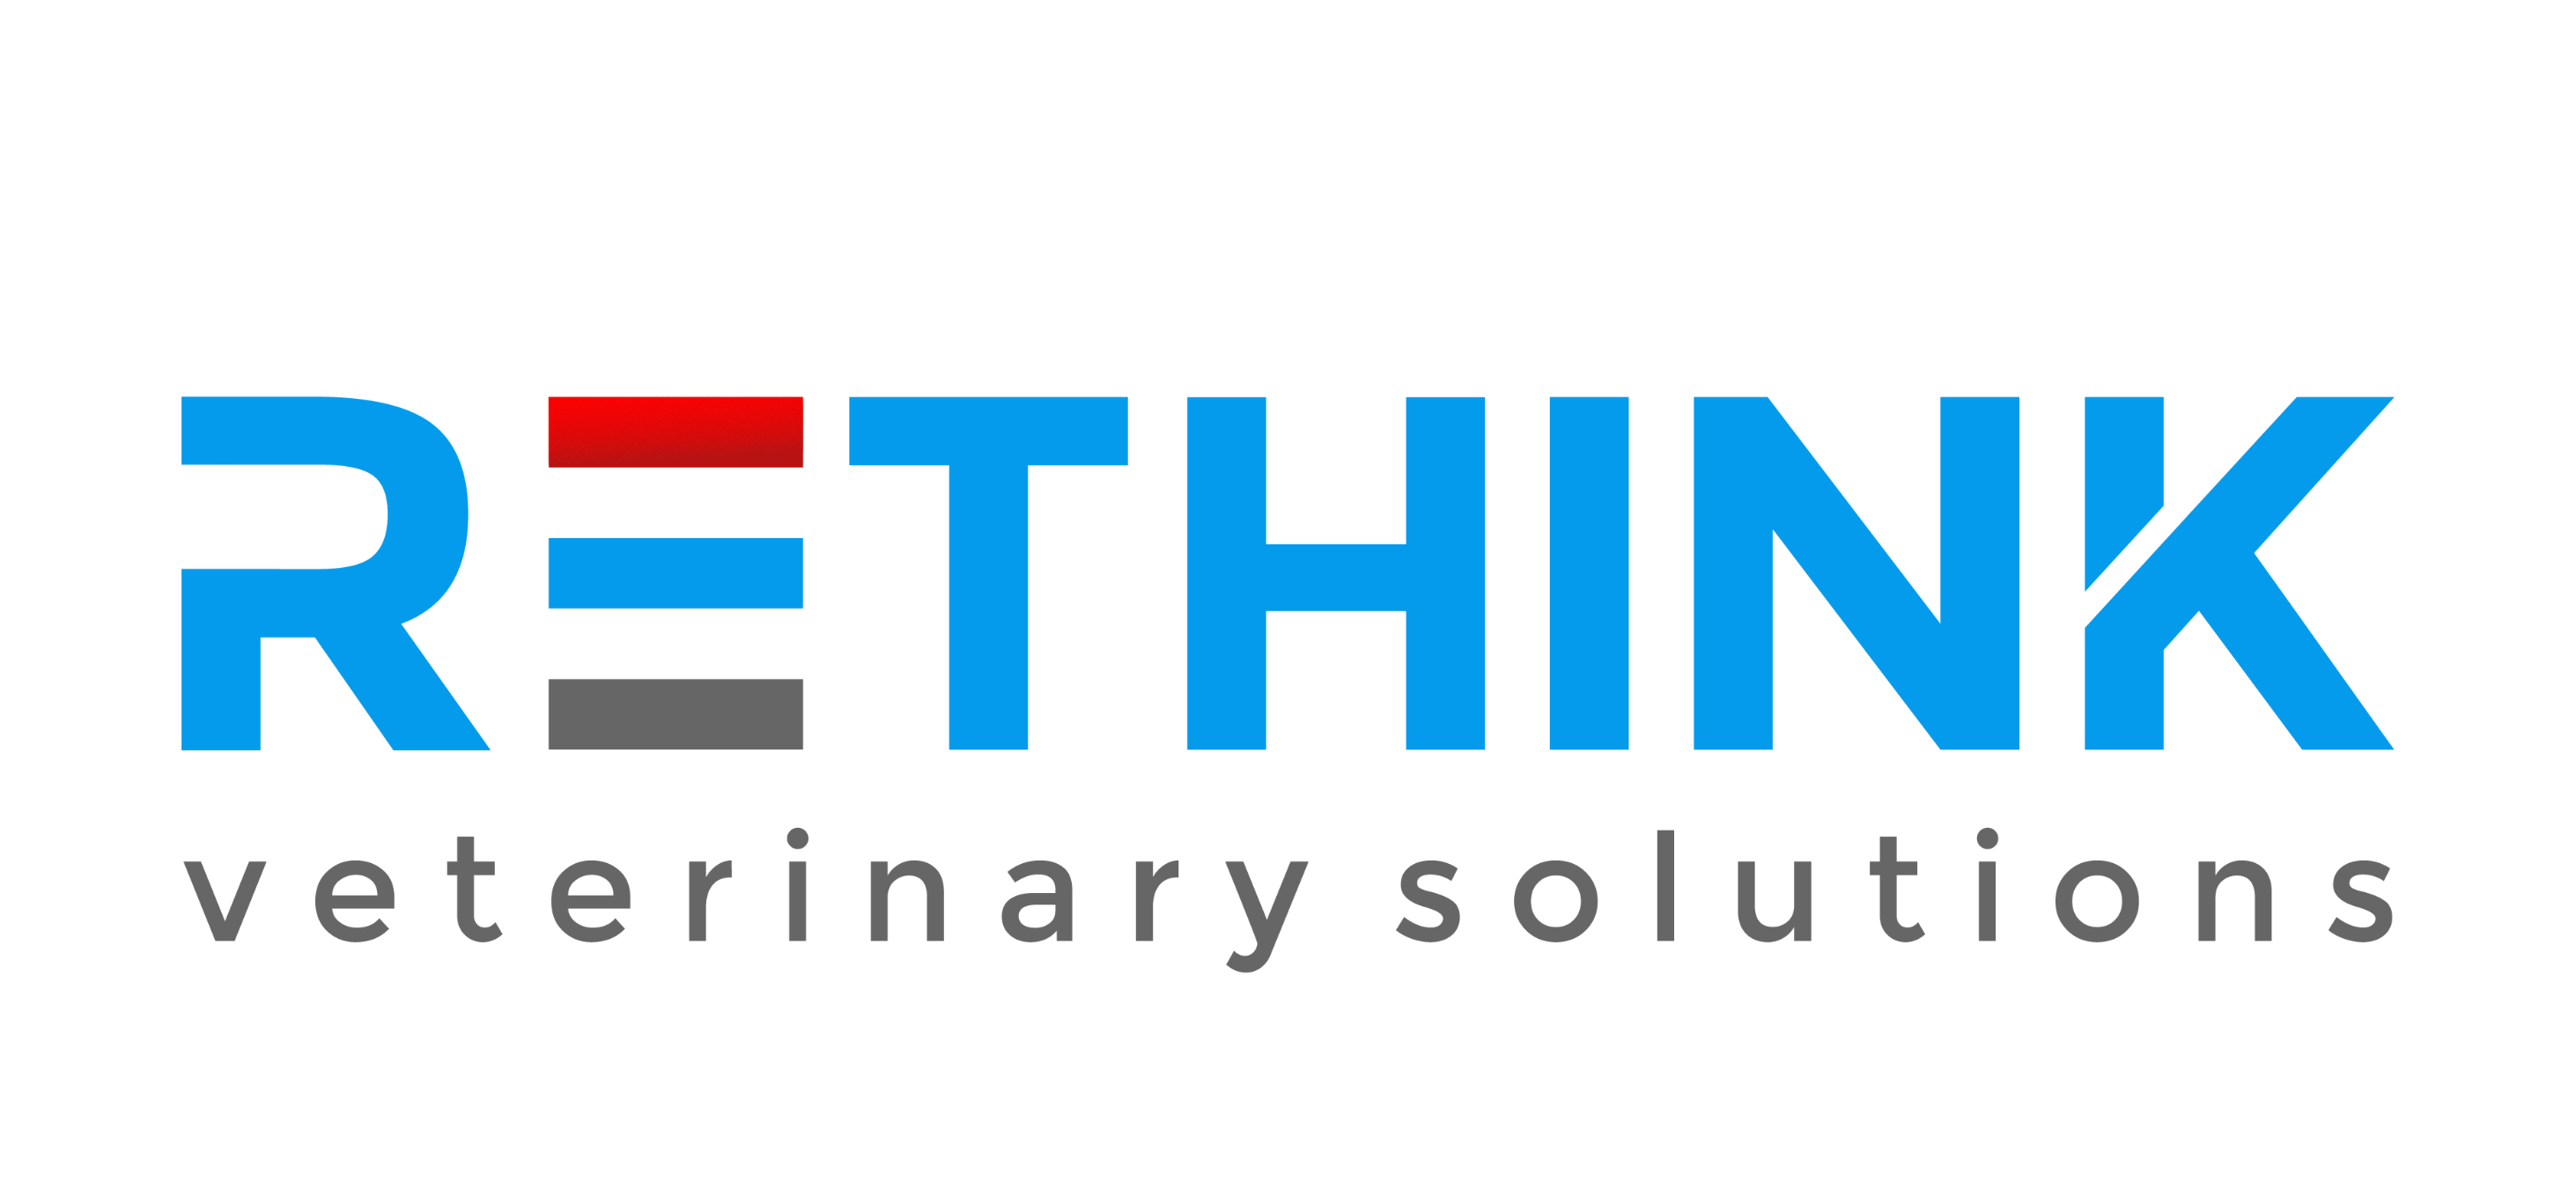 Rethink Veterinary Solutions